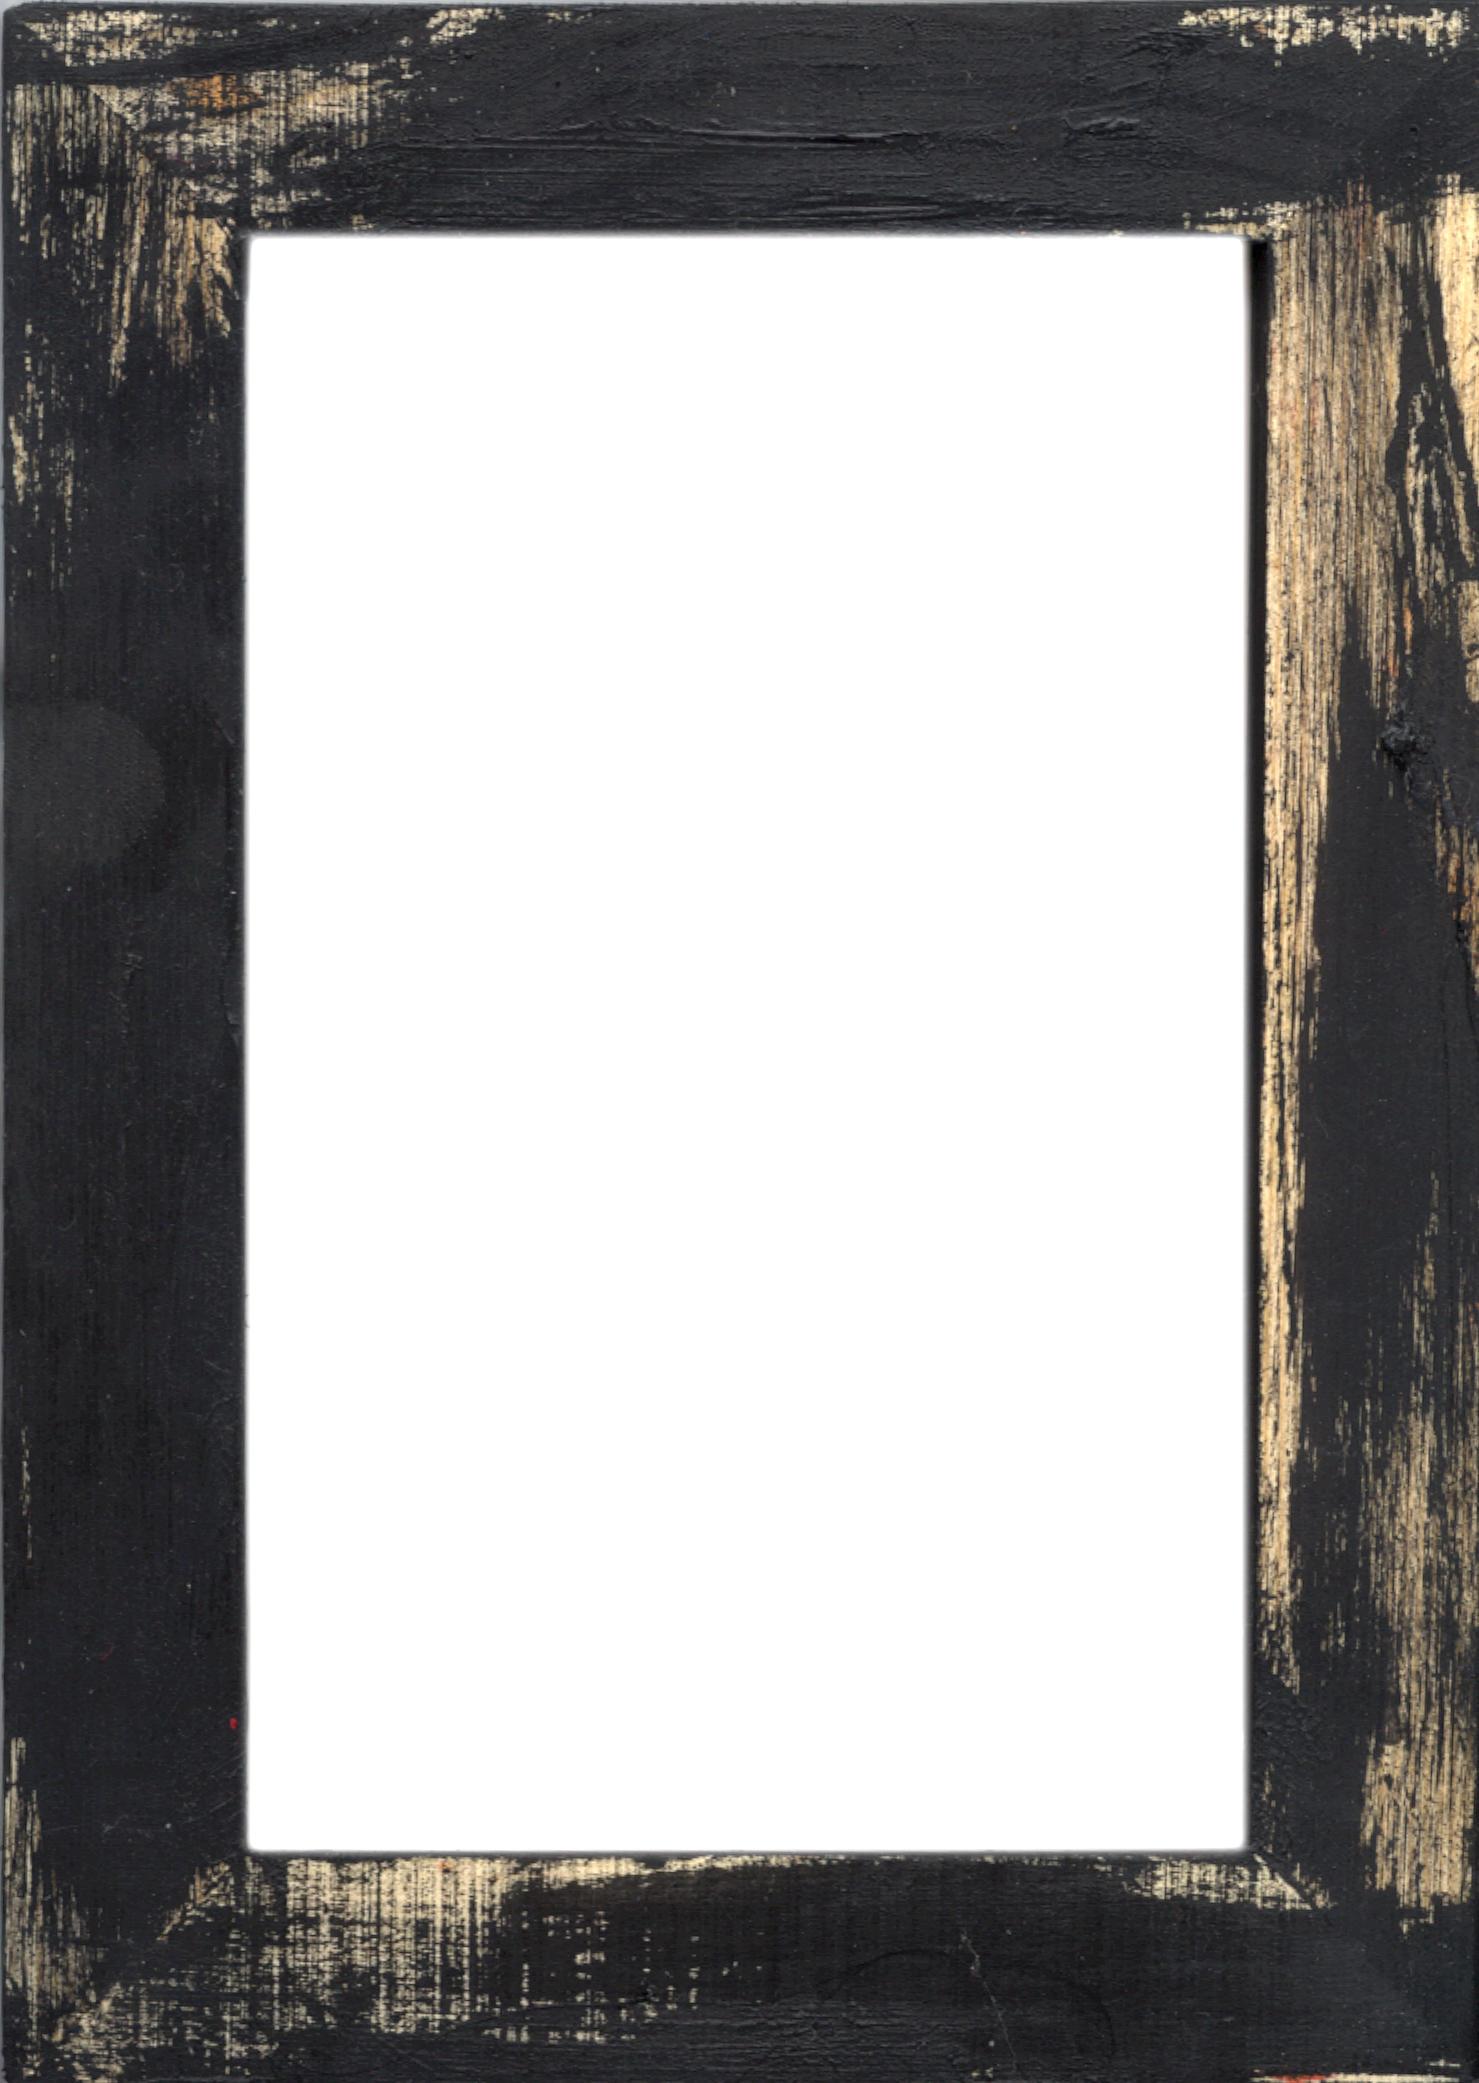 frame by Anilestock